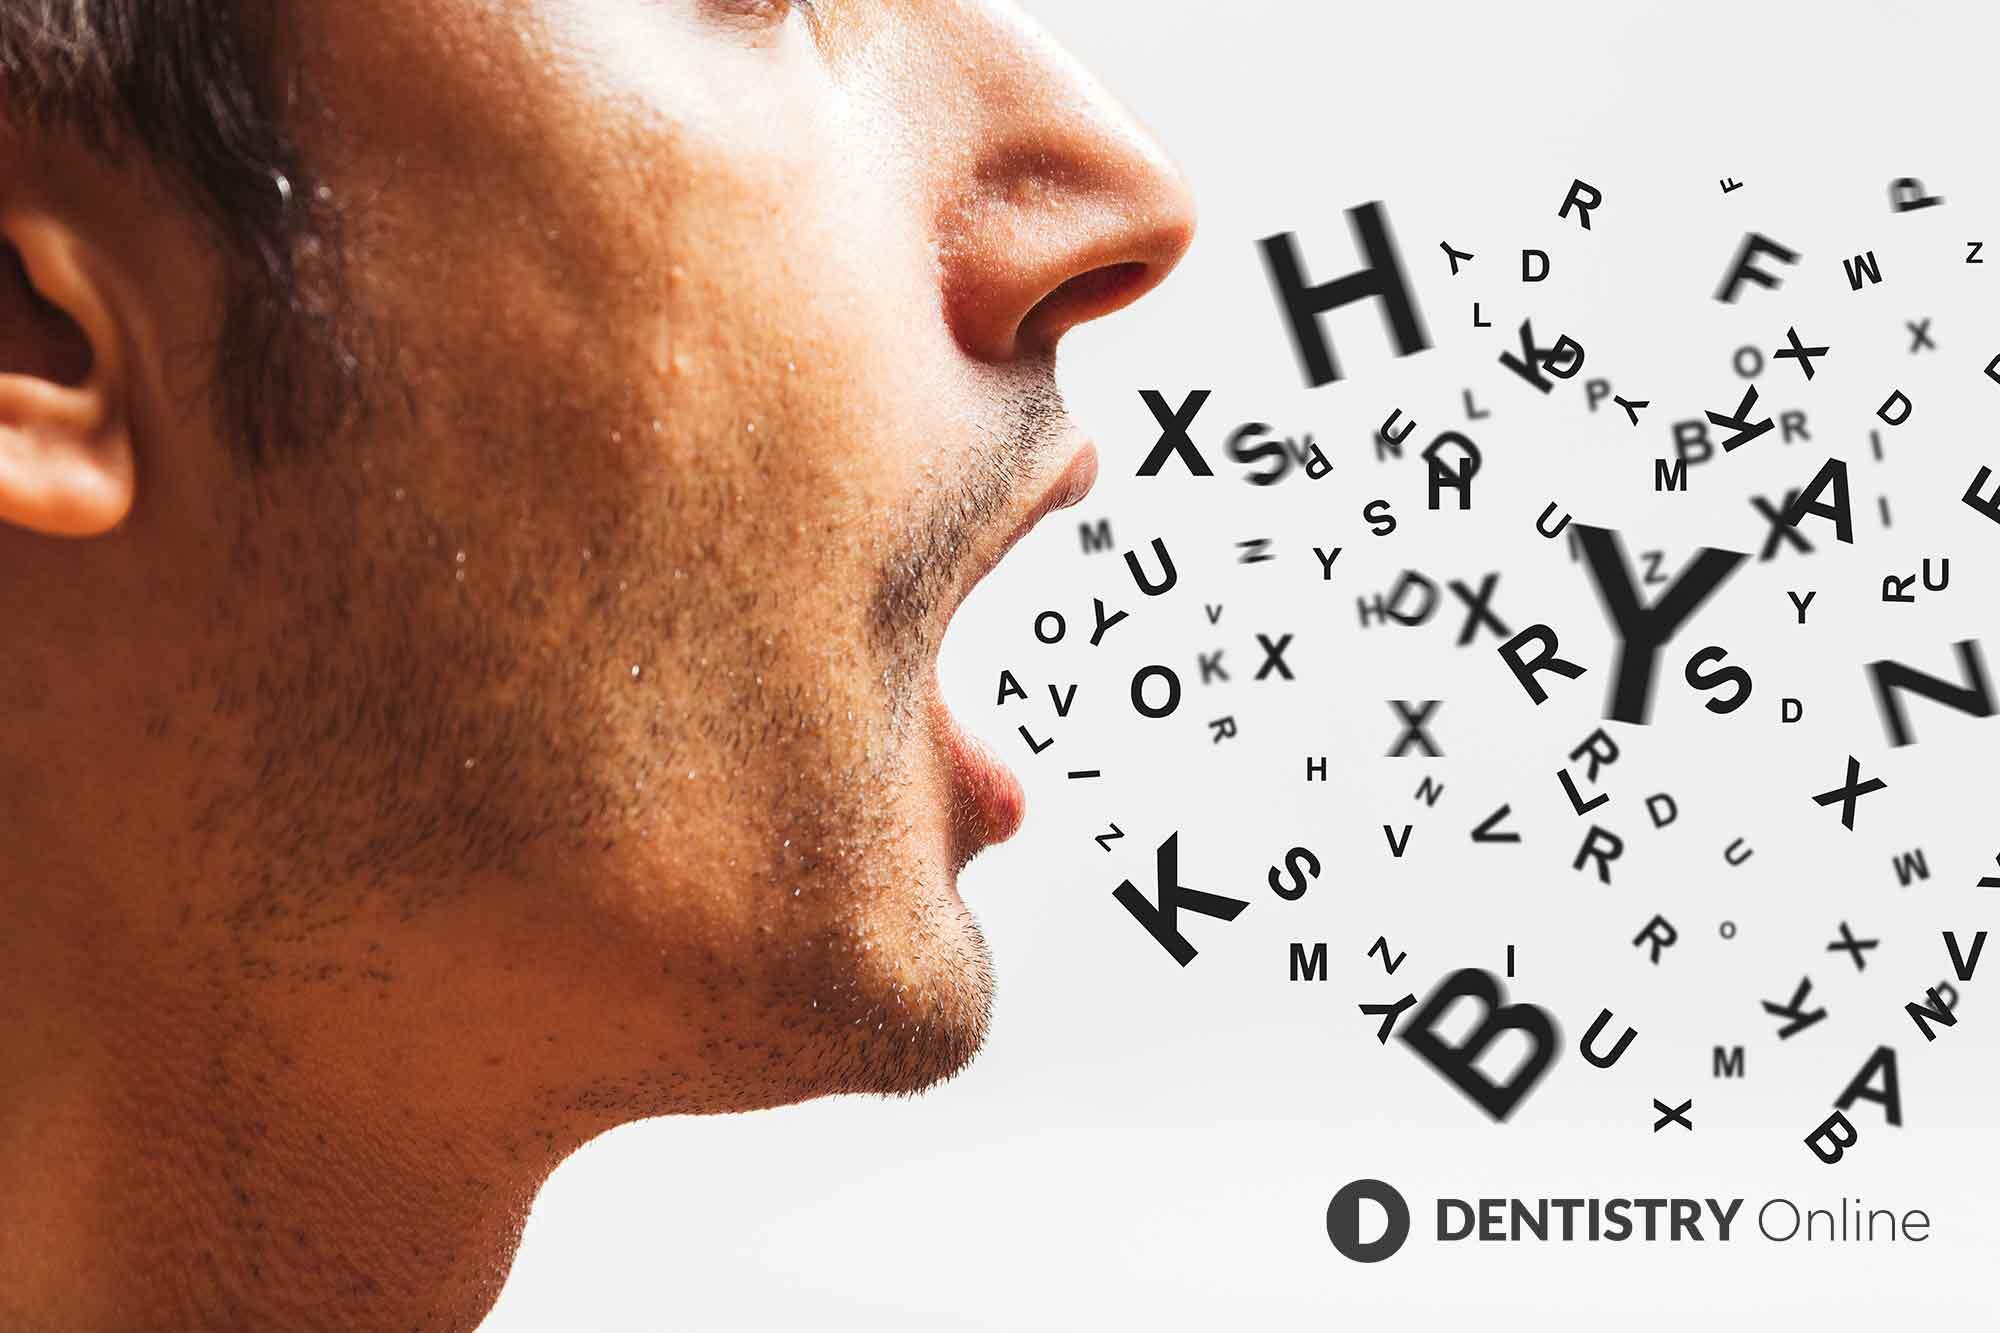 Jane Lelean explains how your linguistic patterns could be stifling your success